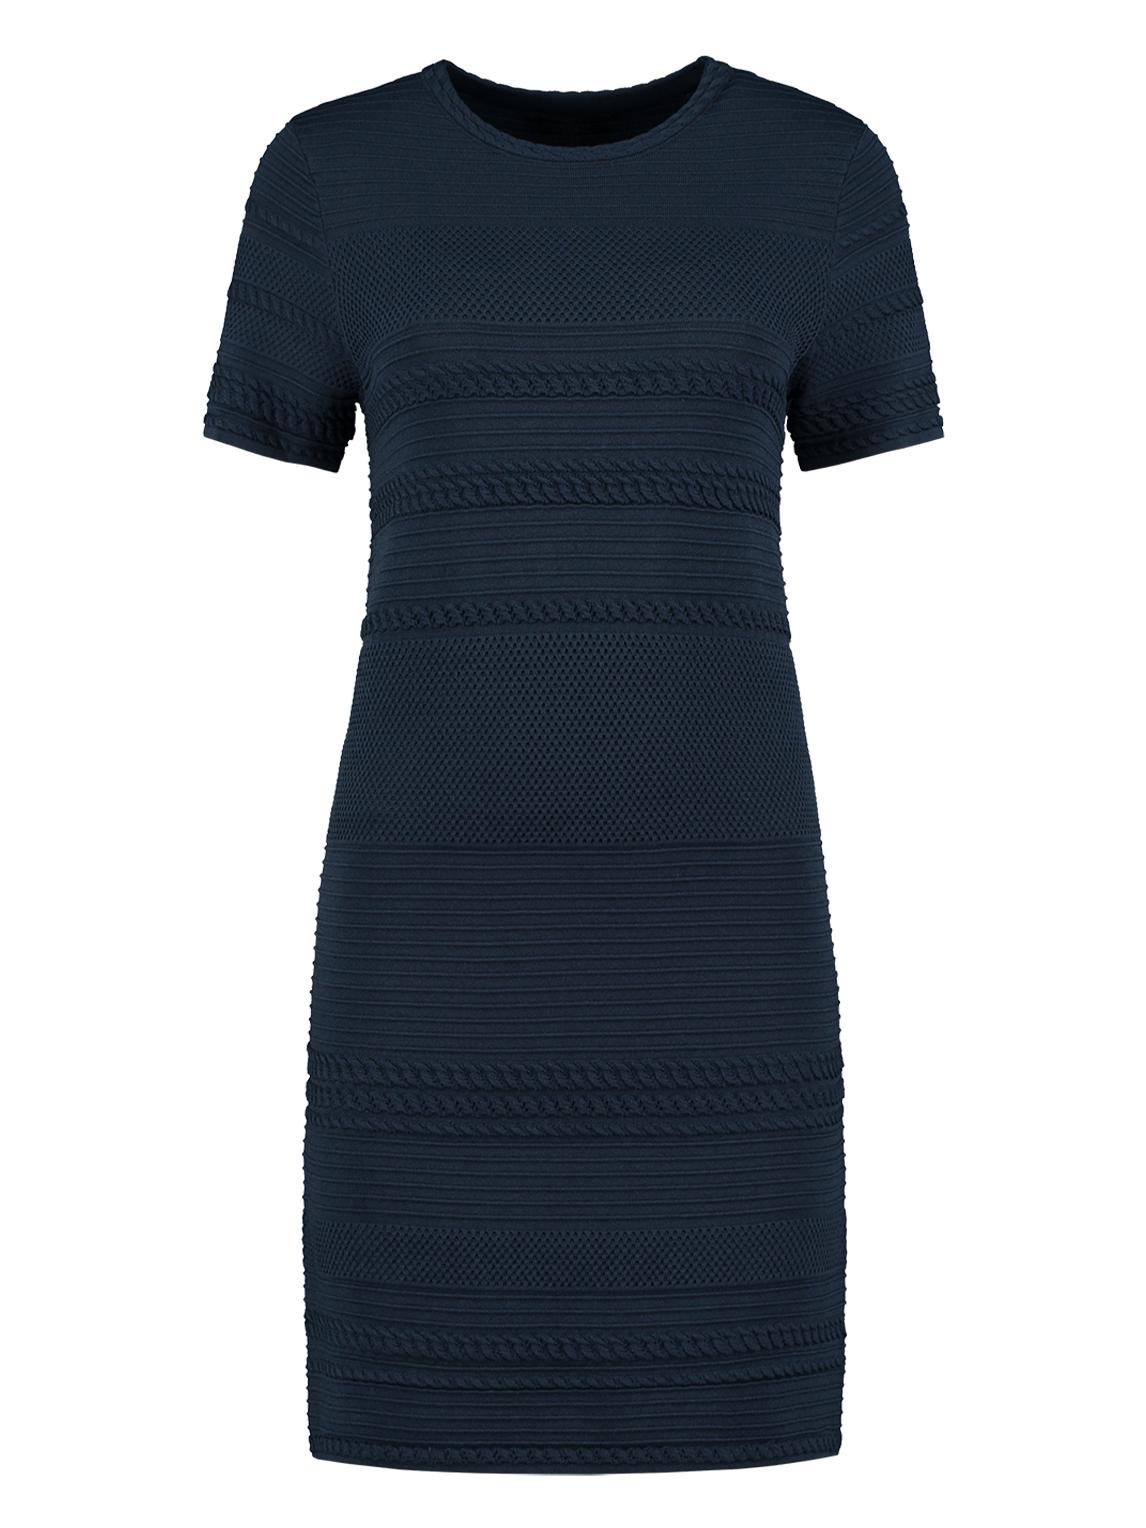 Donker blauwe dames jurk Nikkie - Janel Dress - N7-395 19047800